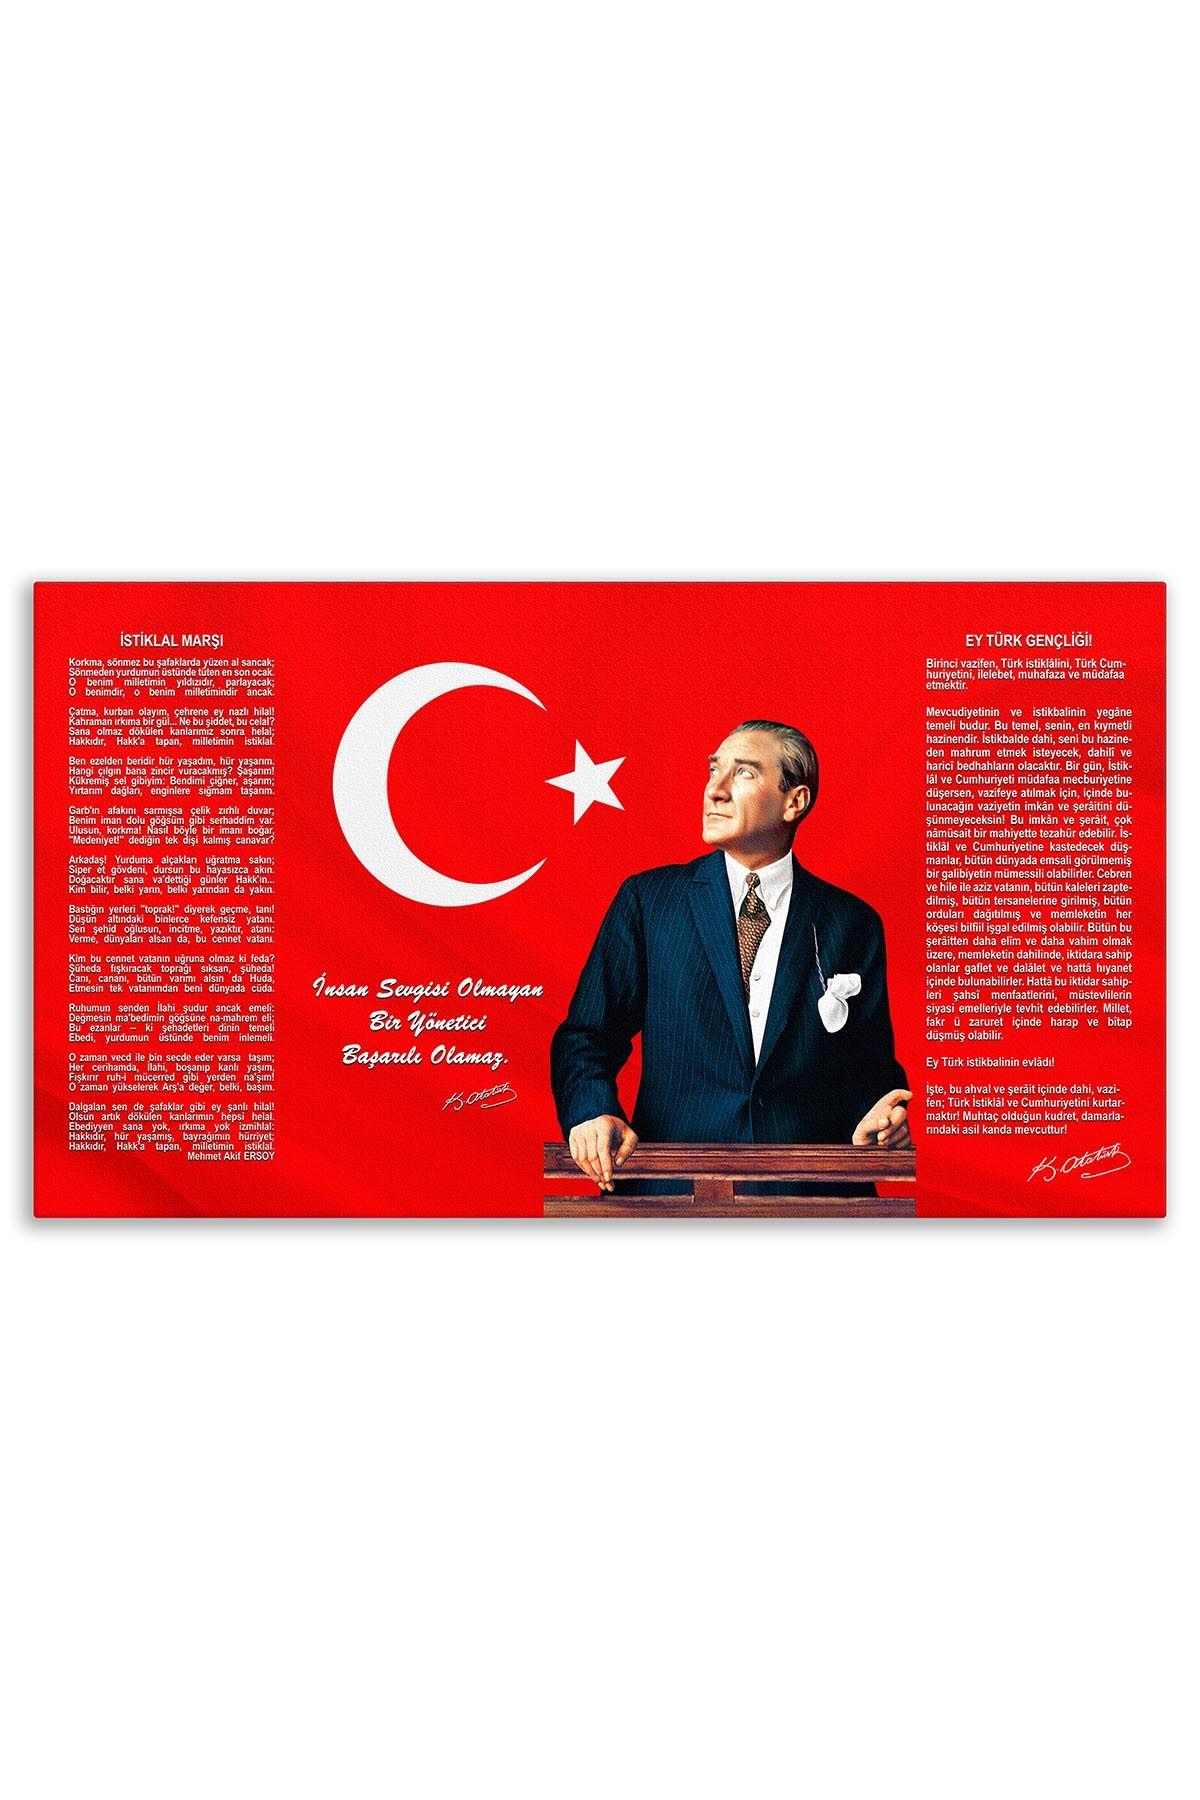 Ataturk Canvas Board With Turkish Flag | Printed Canvas Board | Customized Canvas Board